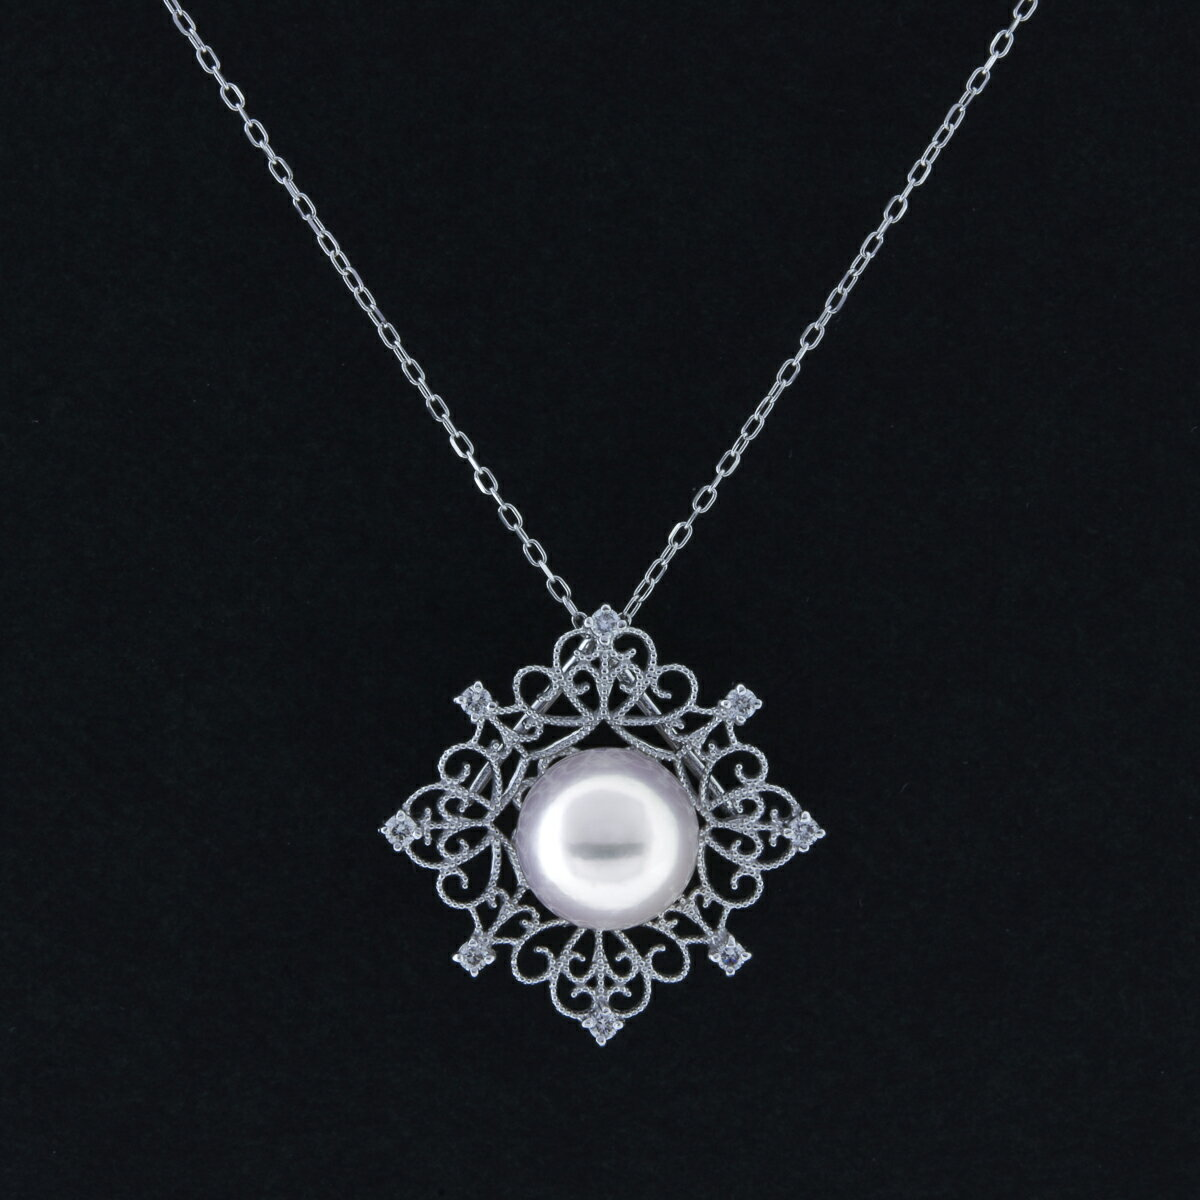 K18WG アコヤ真珠 ダイヤモンド ネックレス